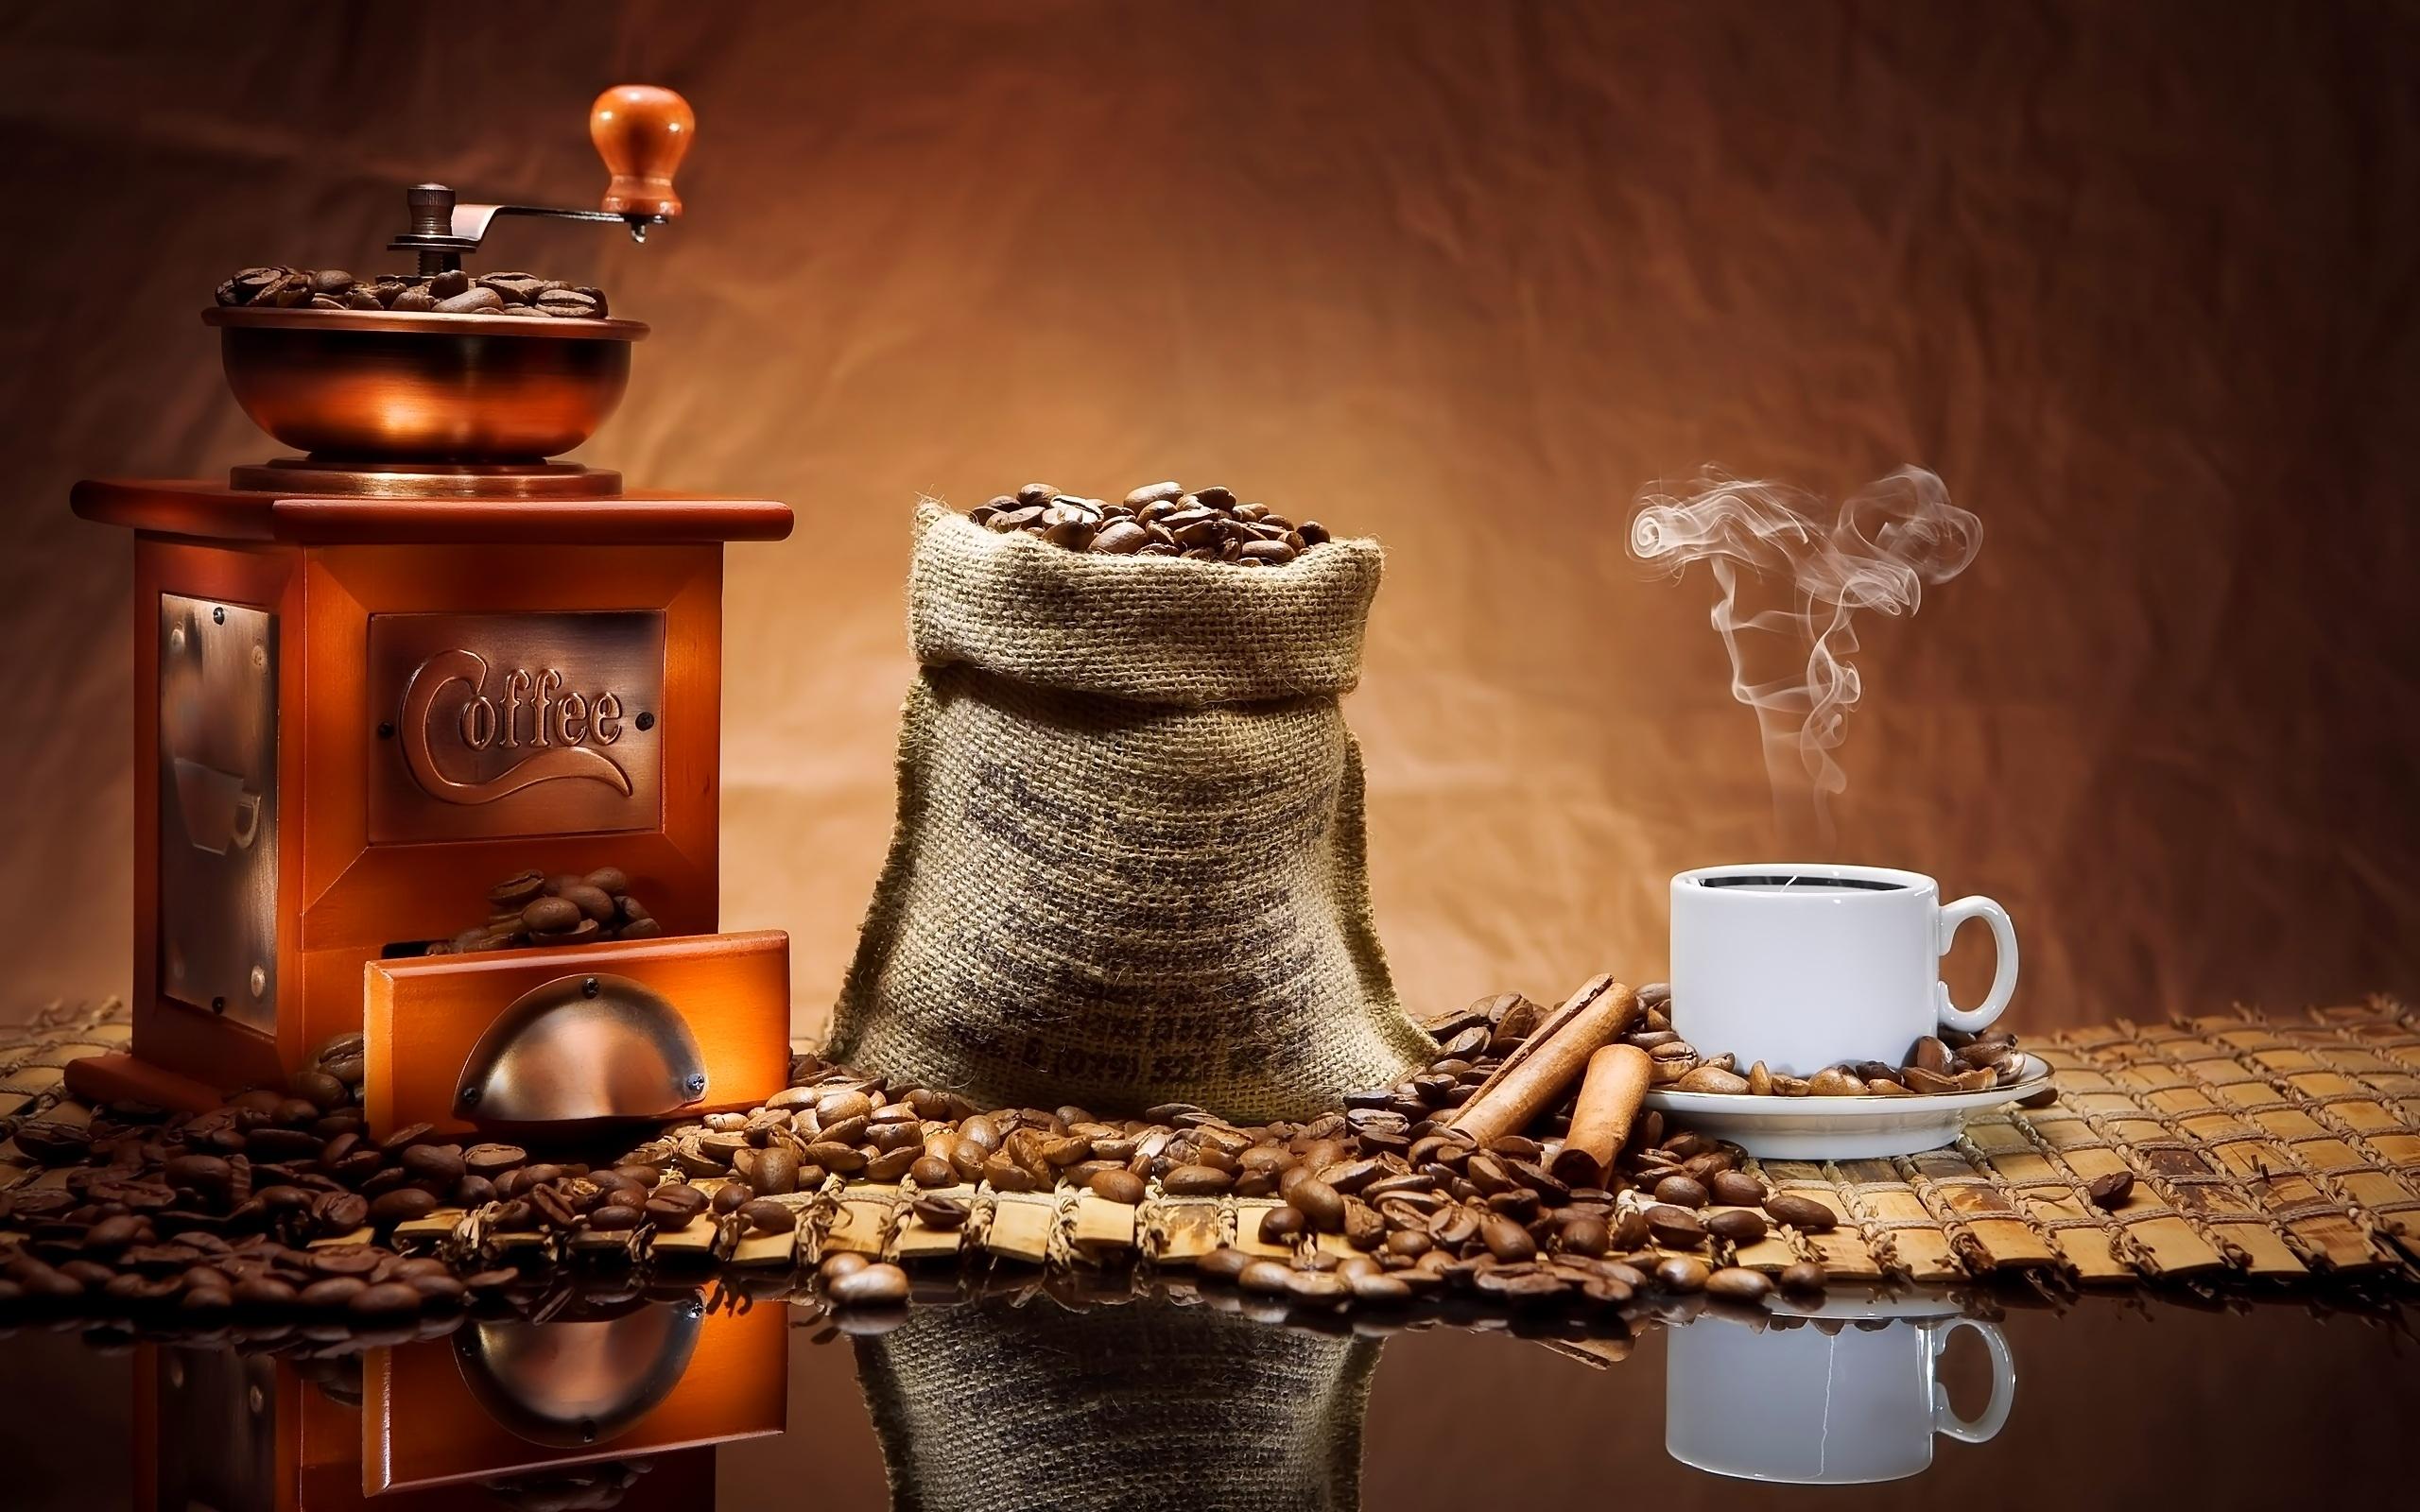 coffee 향